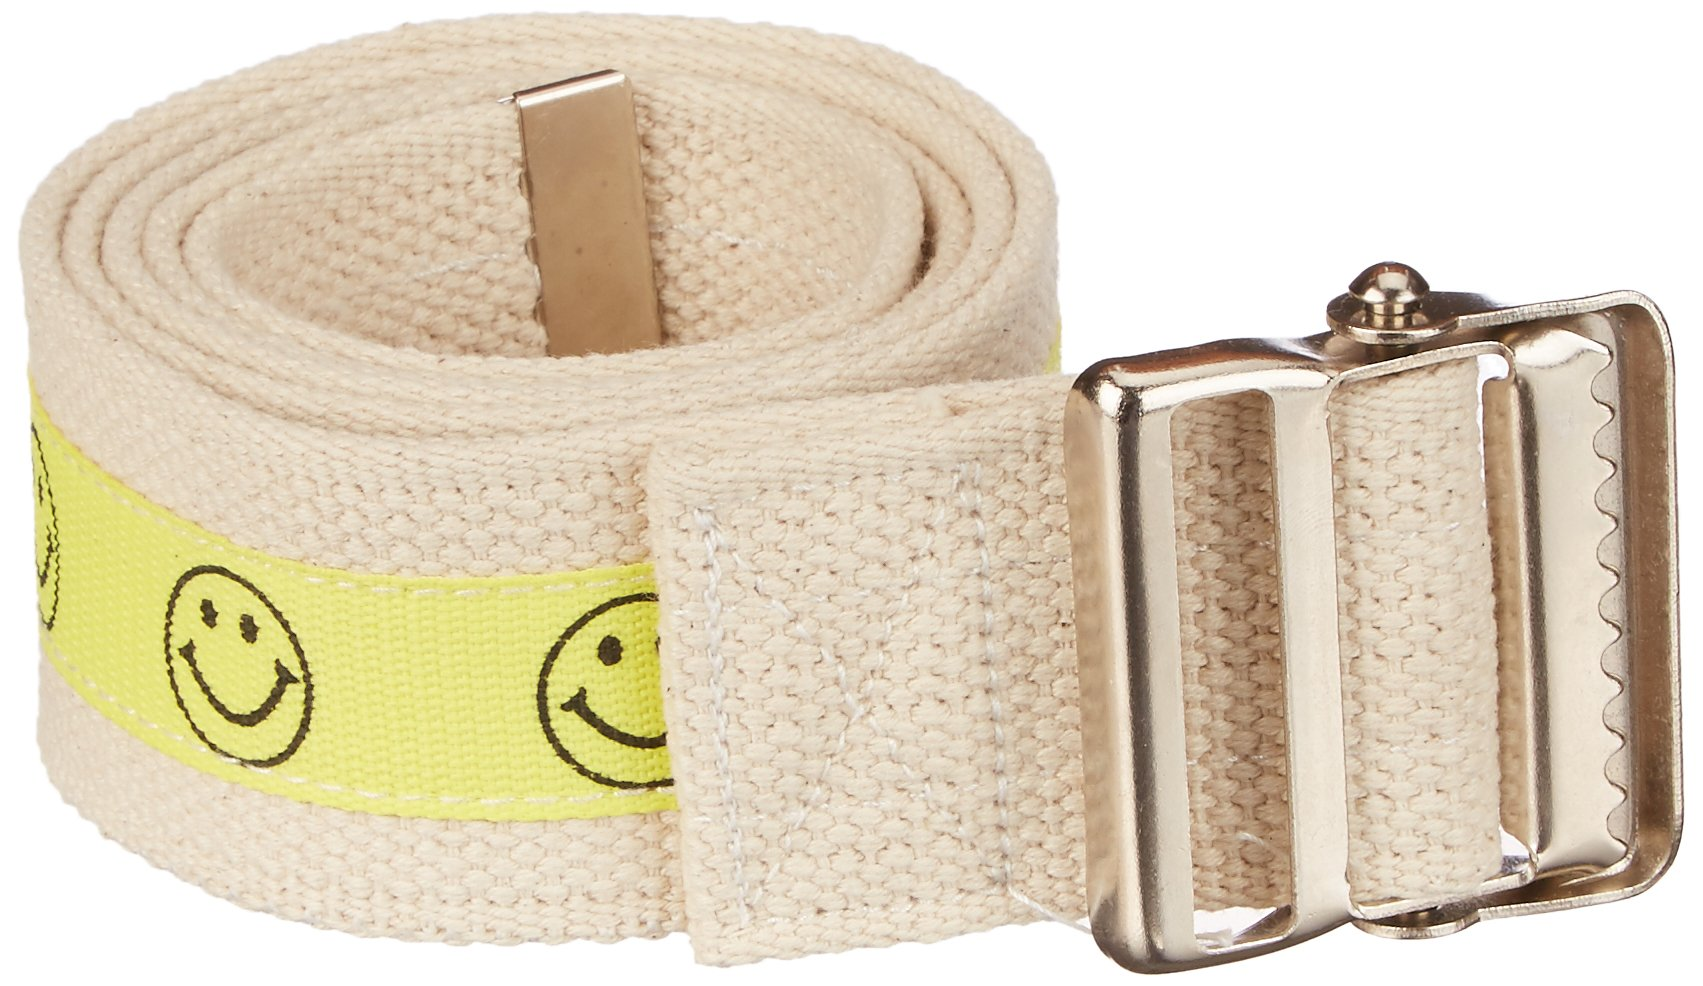 Sammons Preston Designer Gait Belts, Assisted Patient Transfer and Positioning Belt for Limited Mobility, Maximum Strength Gait Belt with Adjustable Buckle for Caregivers, Nurses, Doctors by Sammons Preston